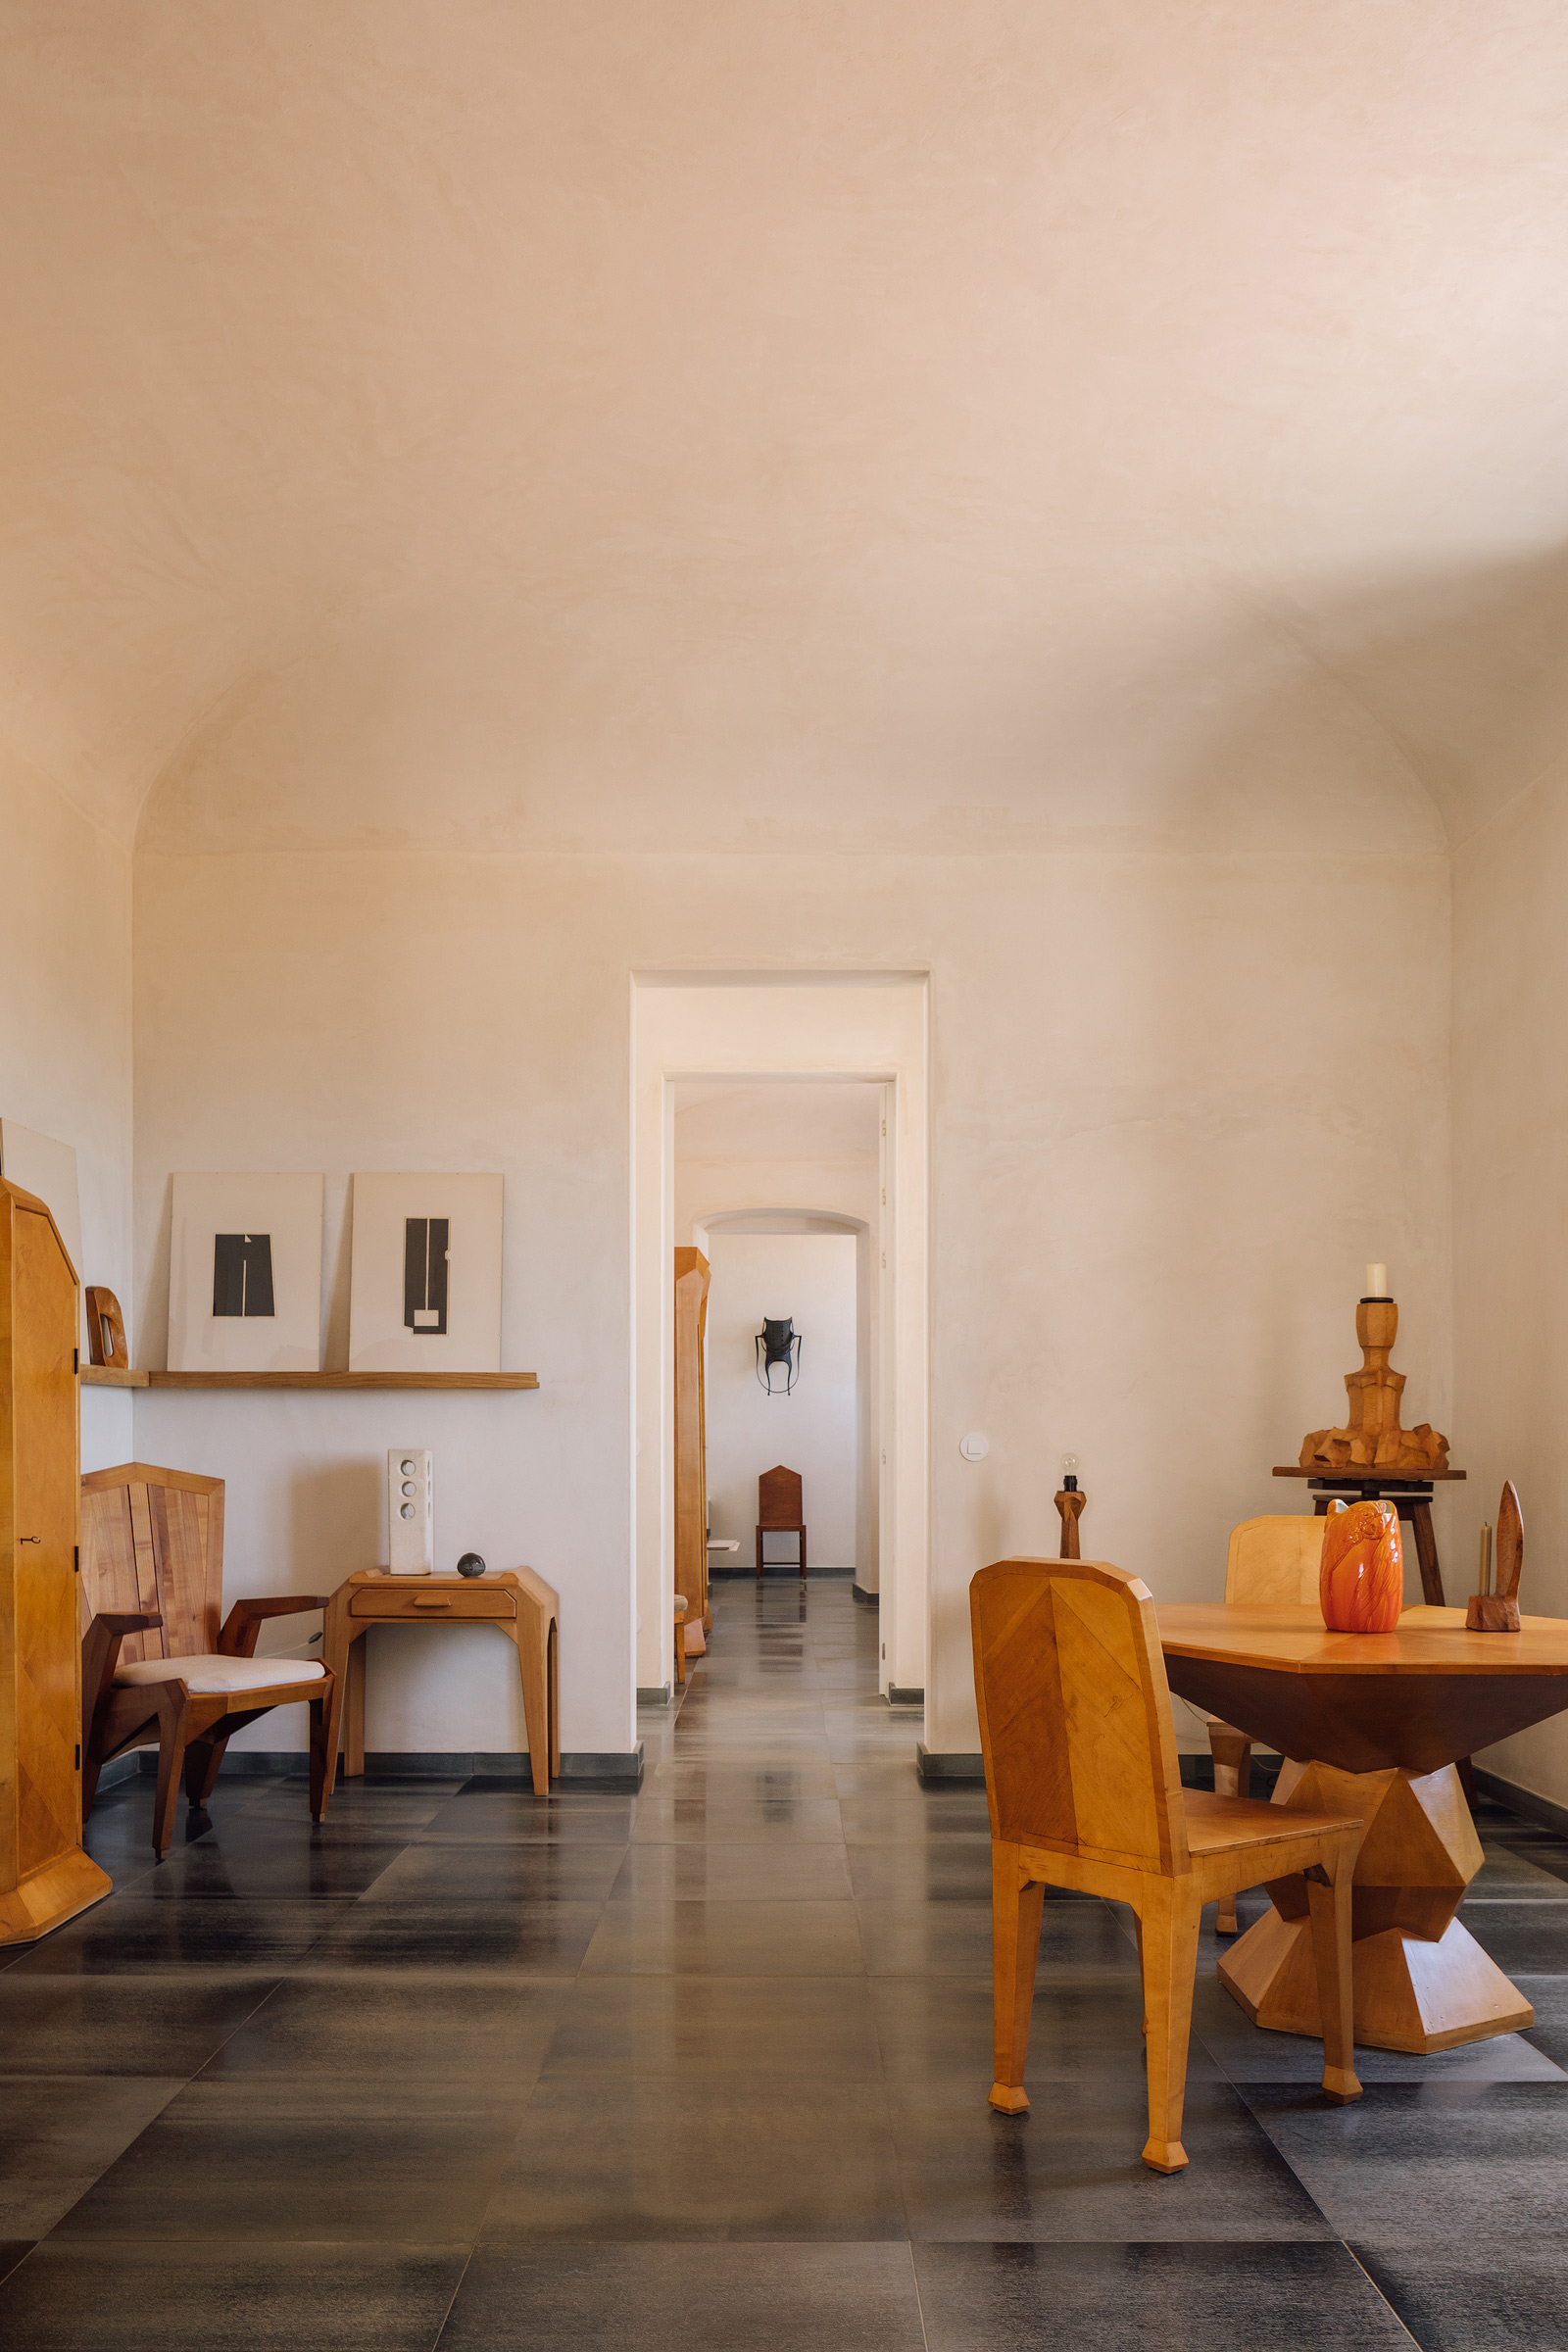 Dalicenca pt stay experiences cubism